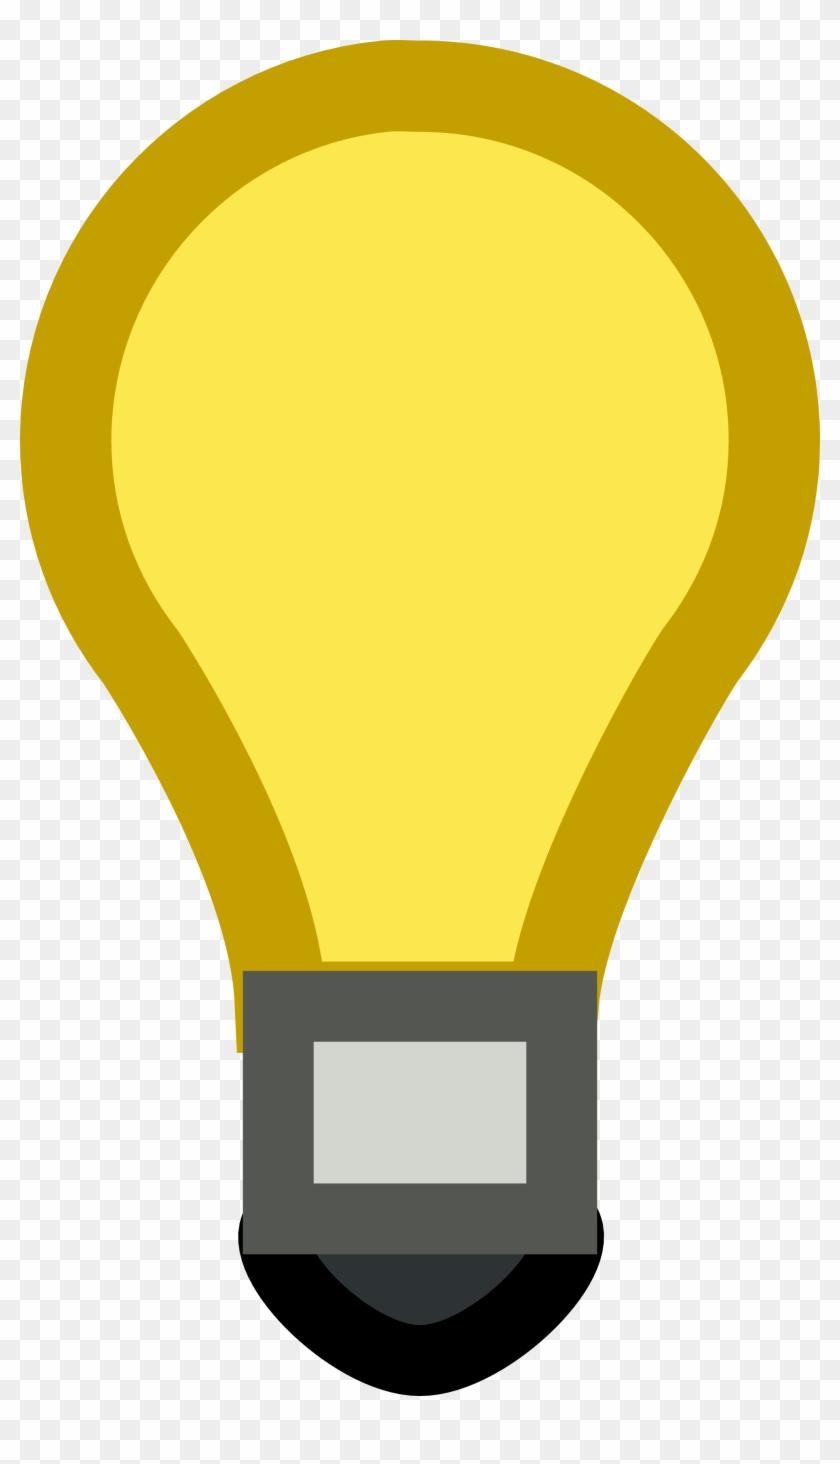 Light Clipart - Light Bulb Clip Art #47184